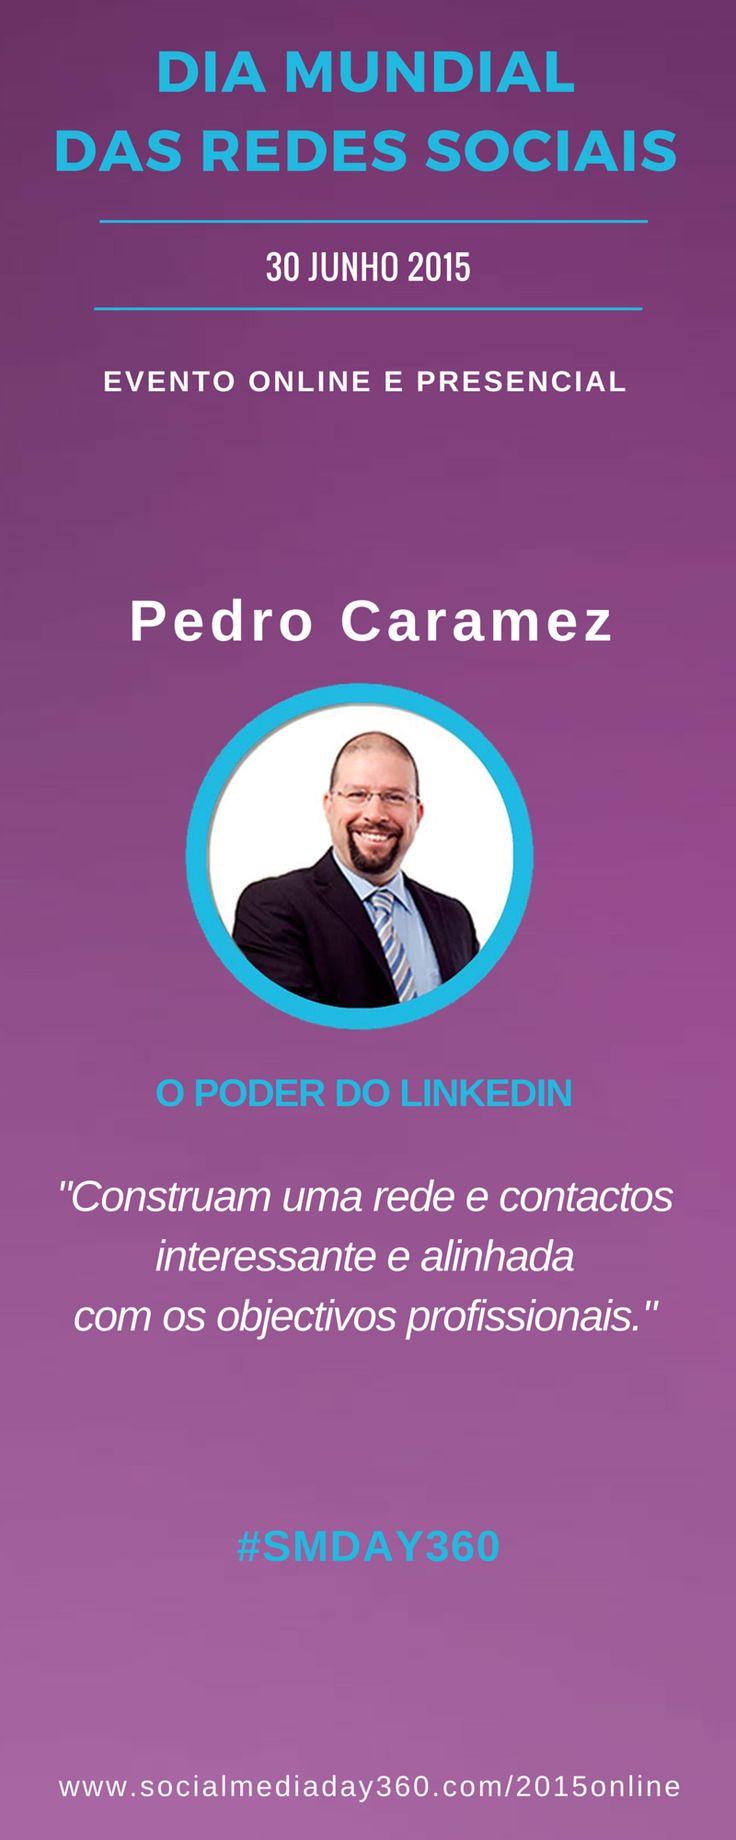 #smday360 Pedro Caramez